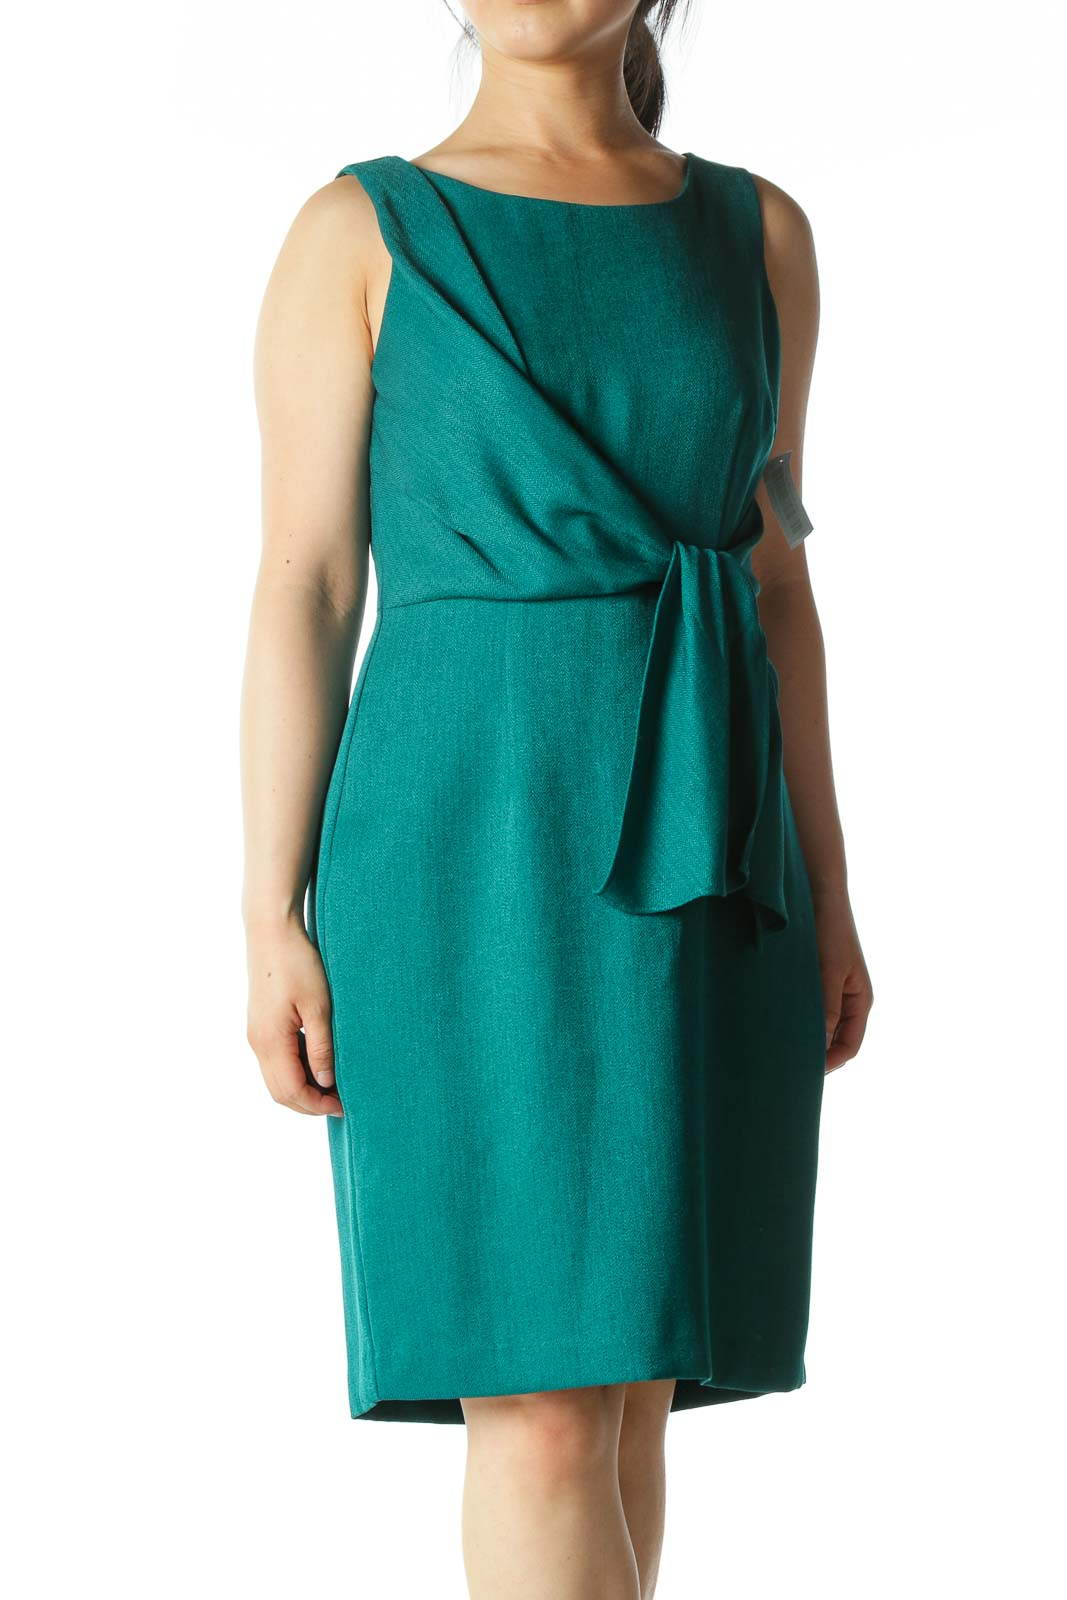 Emerald-Green Front-Tie A-Line Work Dress